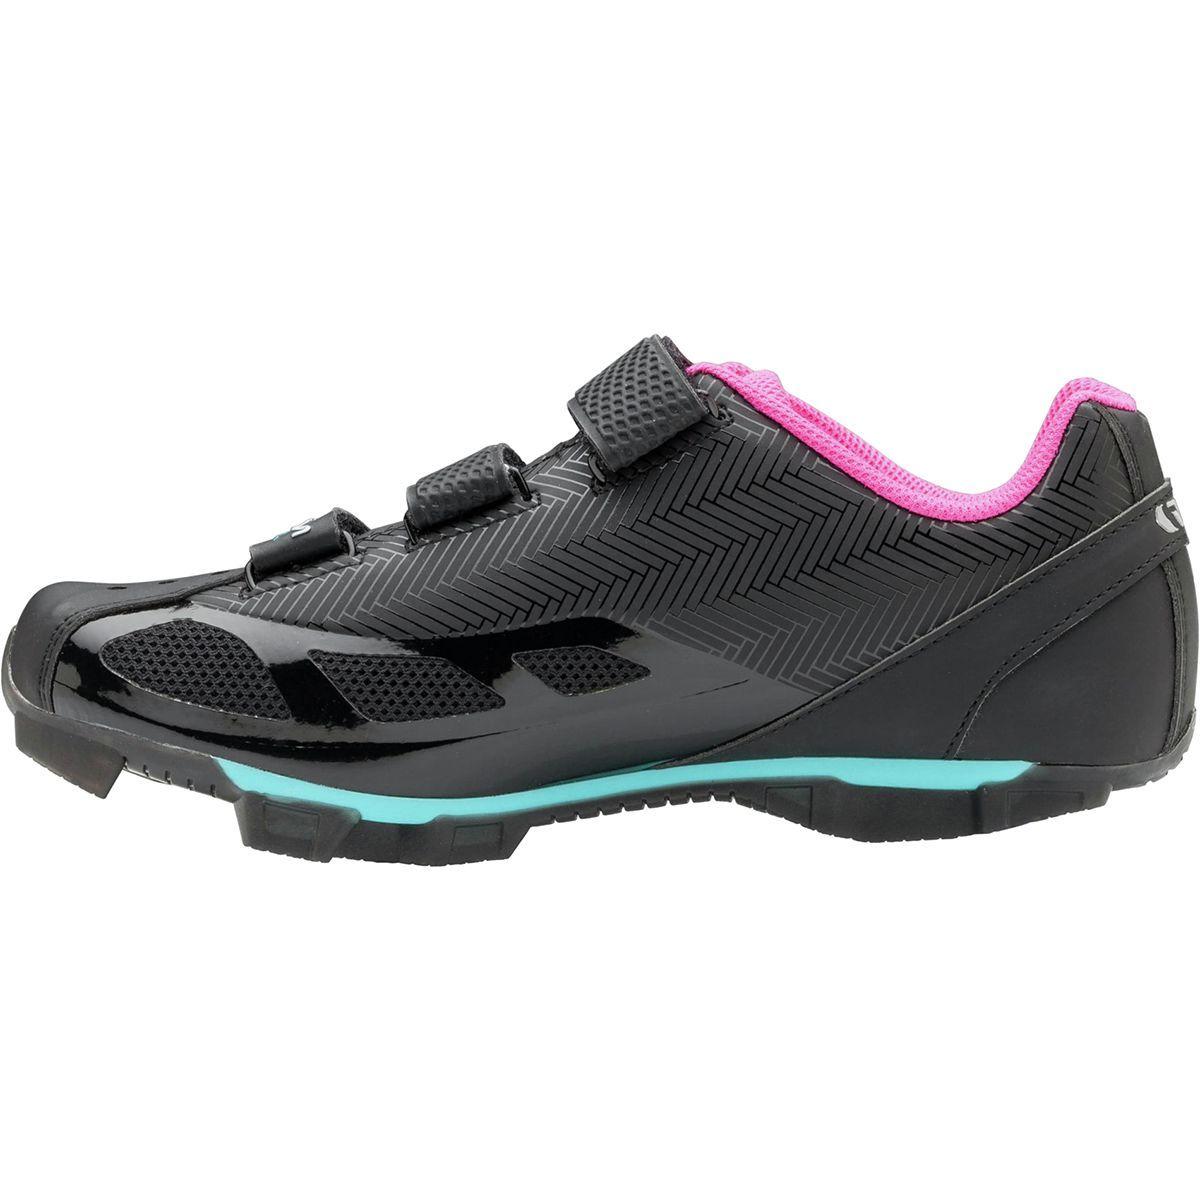 Louis Garneau Multi Air Flex Cycling Shoe - Women's